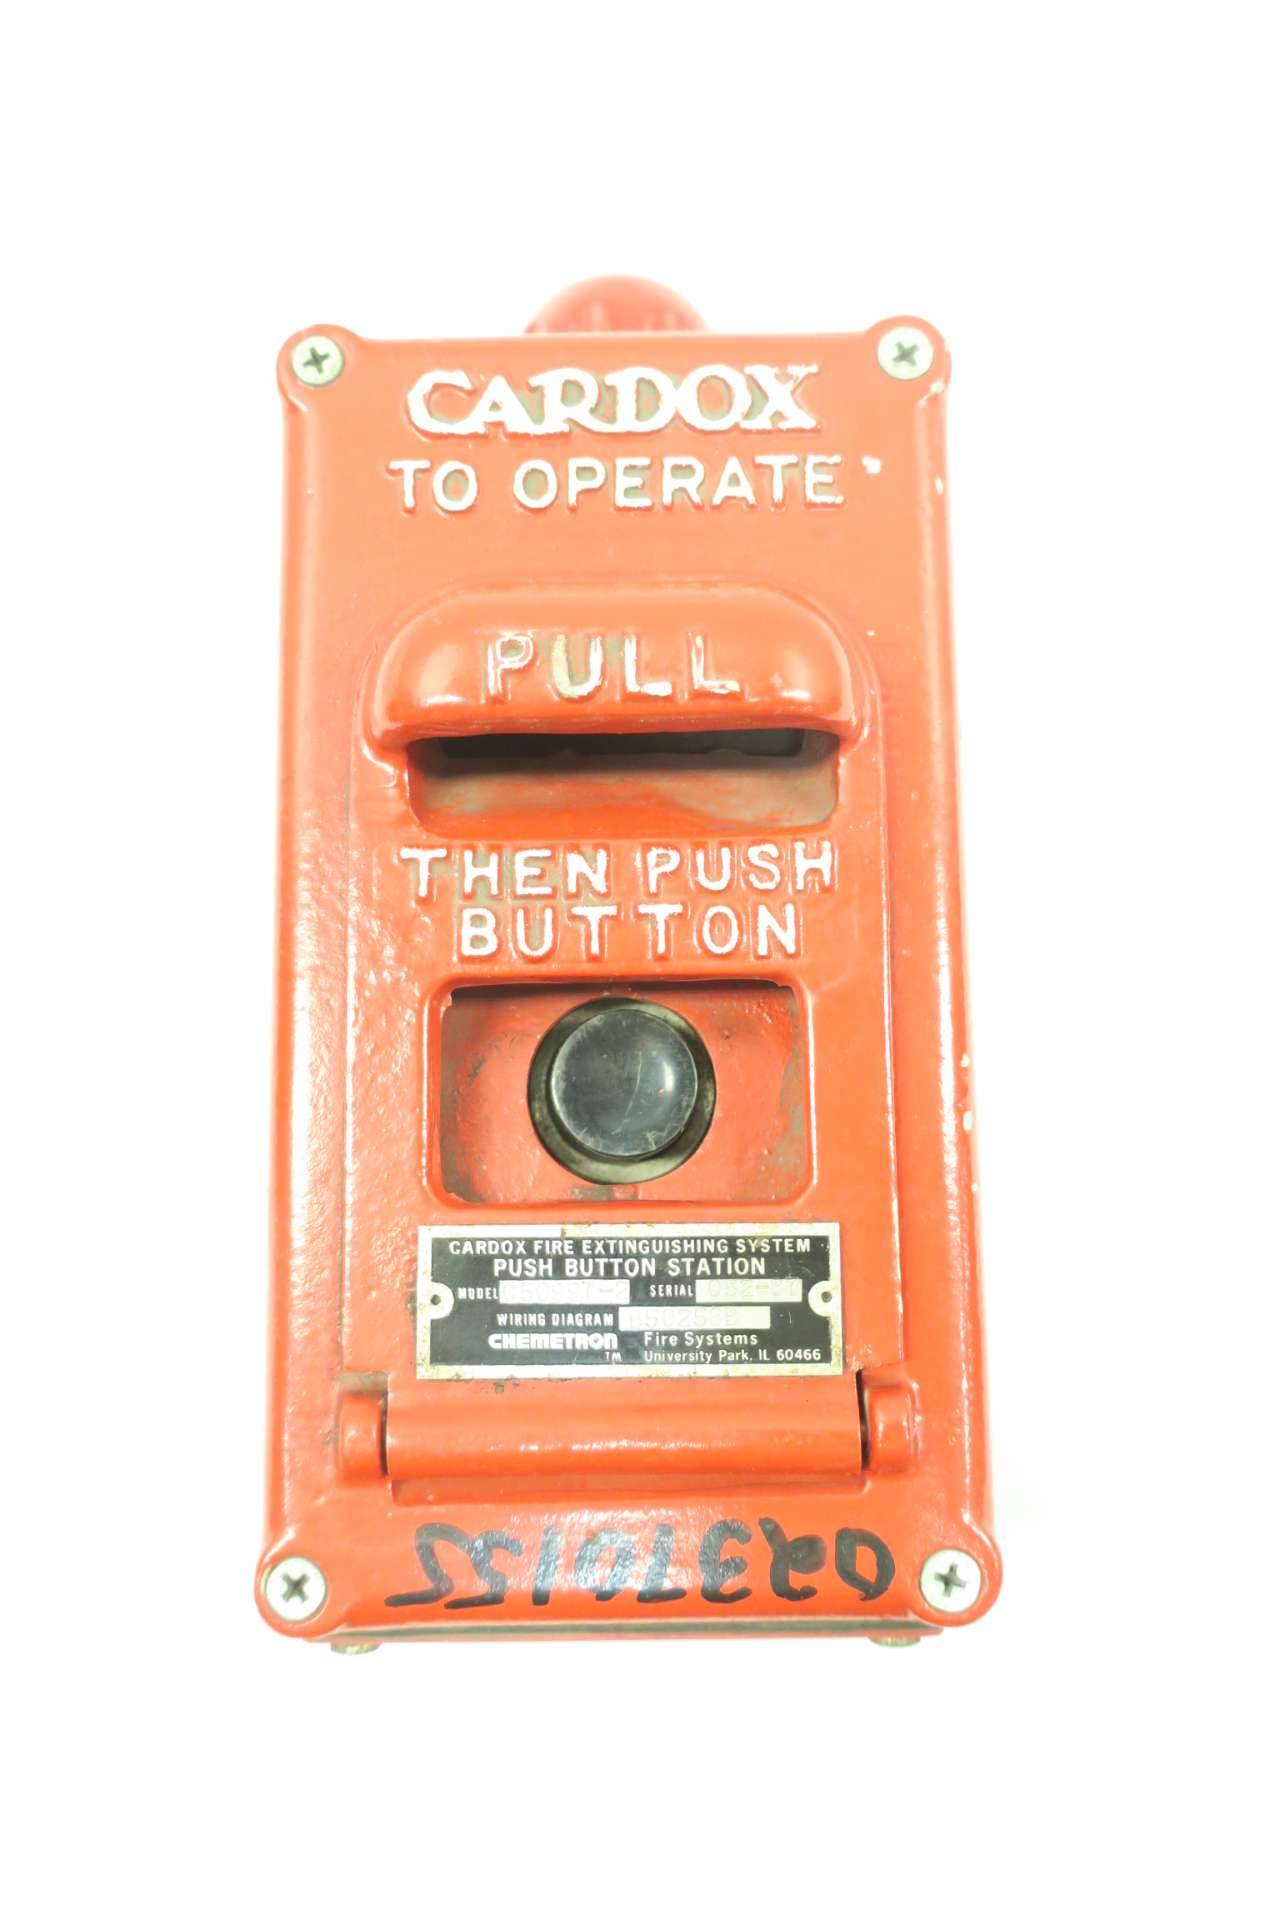 [EQHS_1162]  CARDOX C50997-2 CHEMETRON FIRE EXTINGUISHING PUSHBUTTON STATION D552558   Chemetron Wiring Diagrams      NRI Industrial